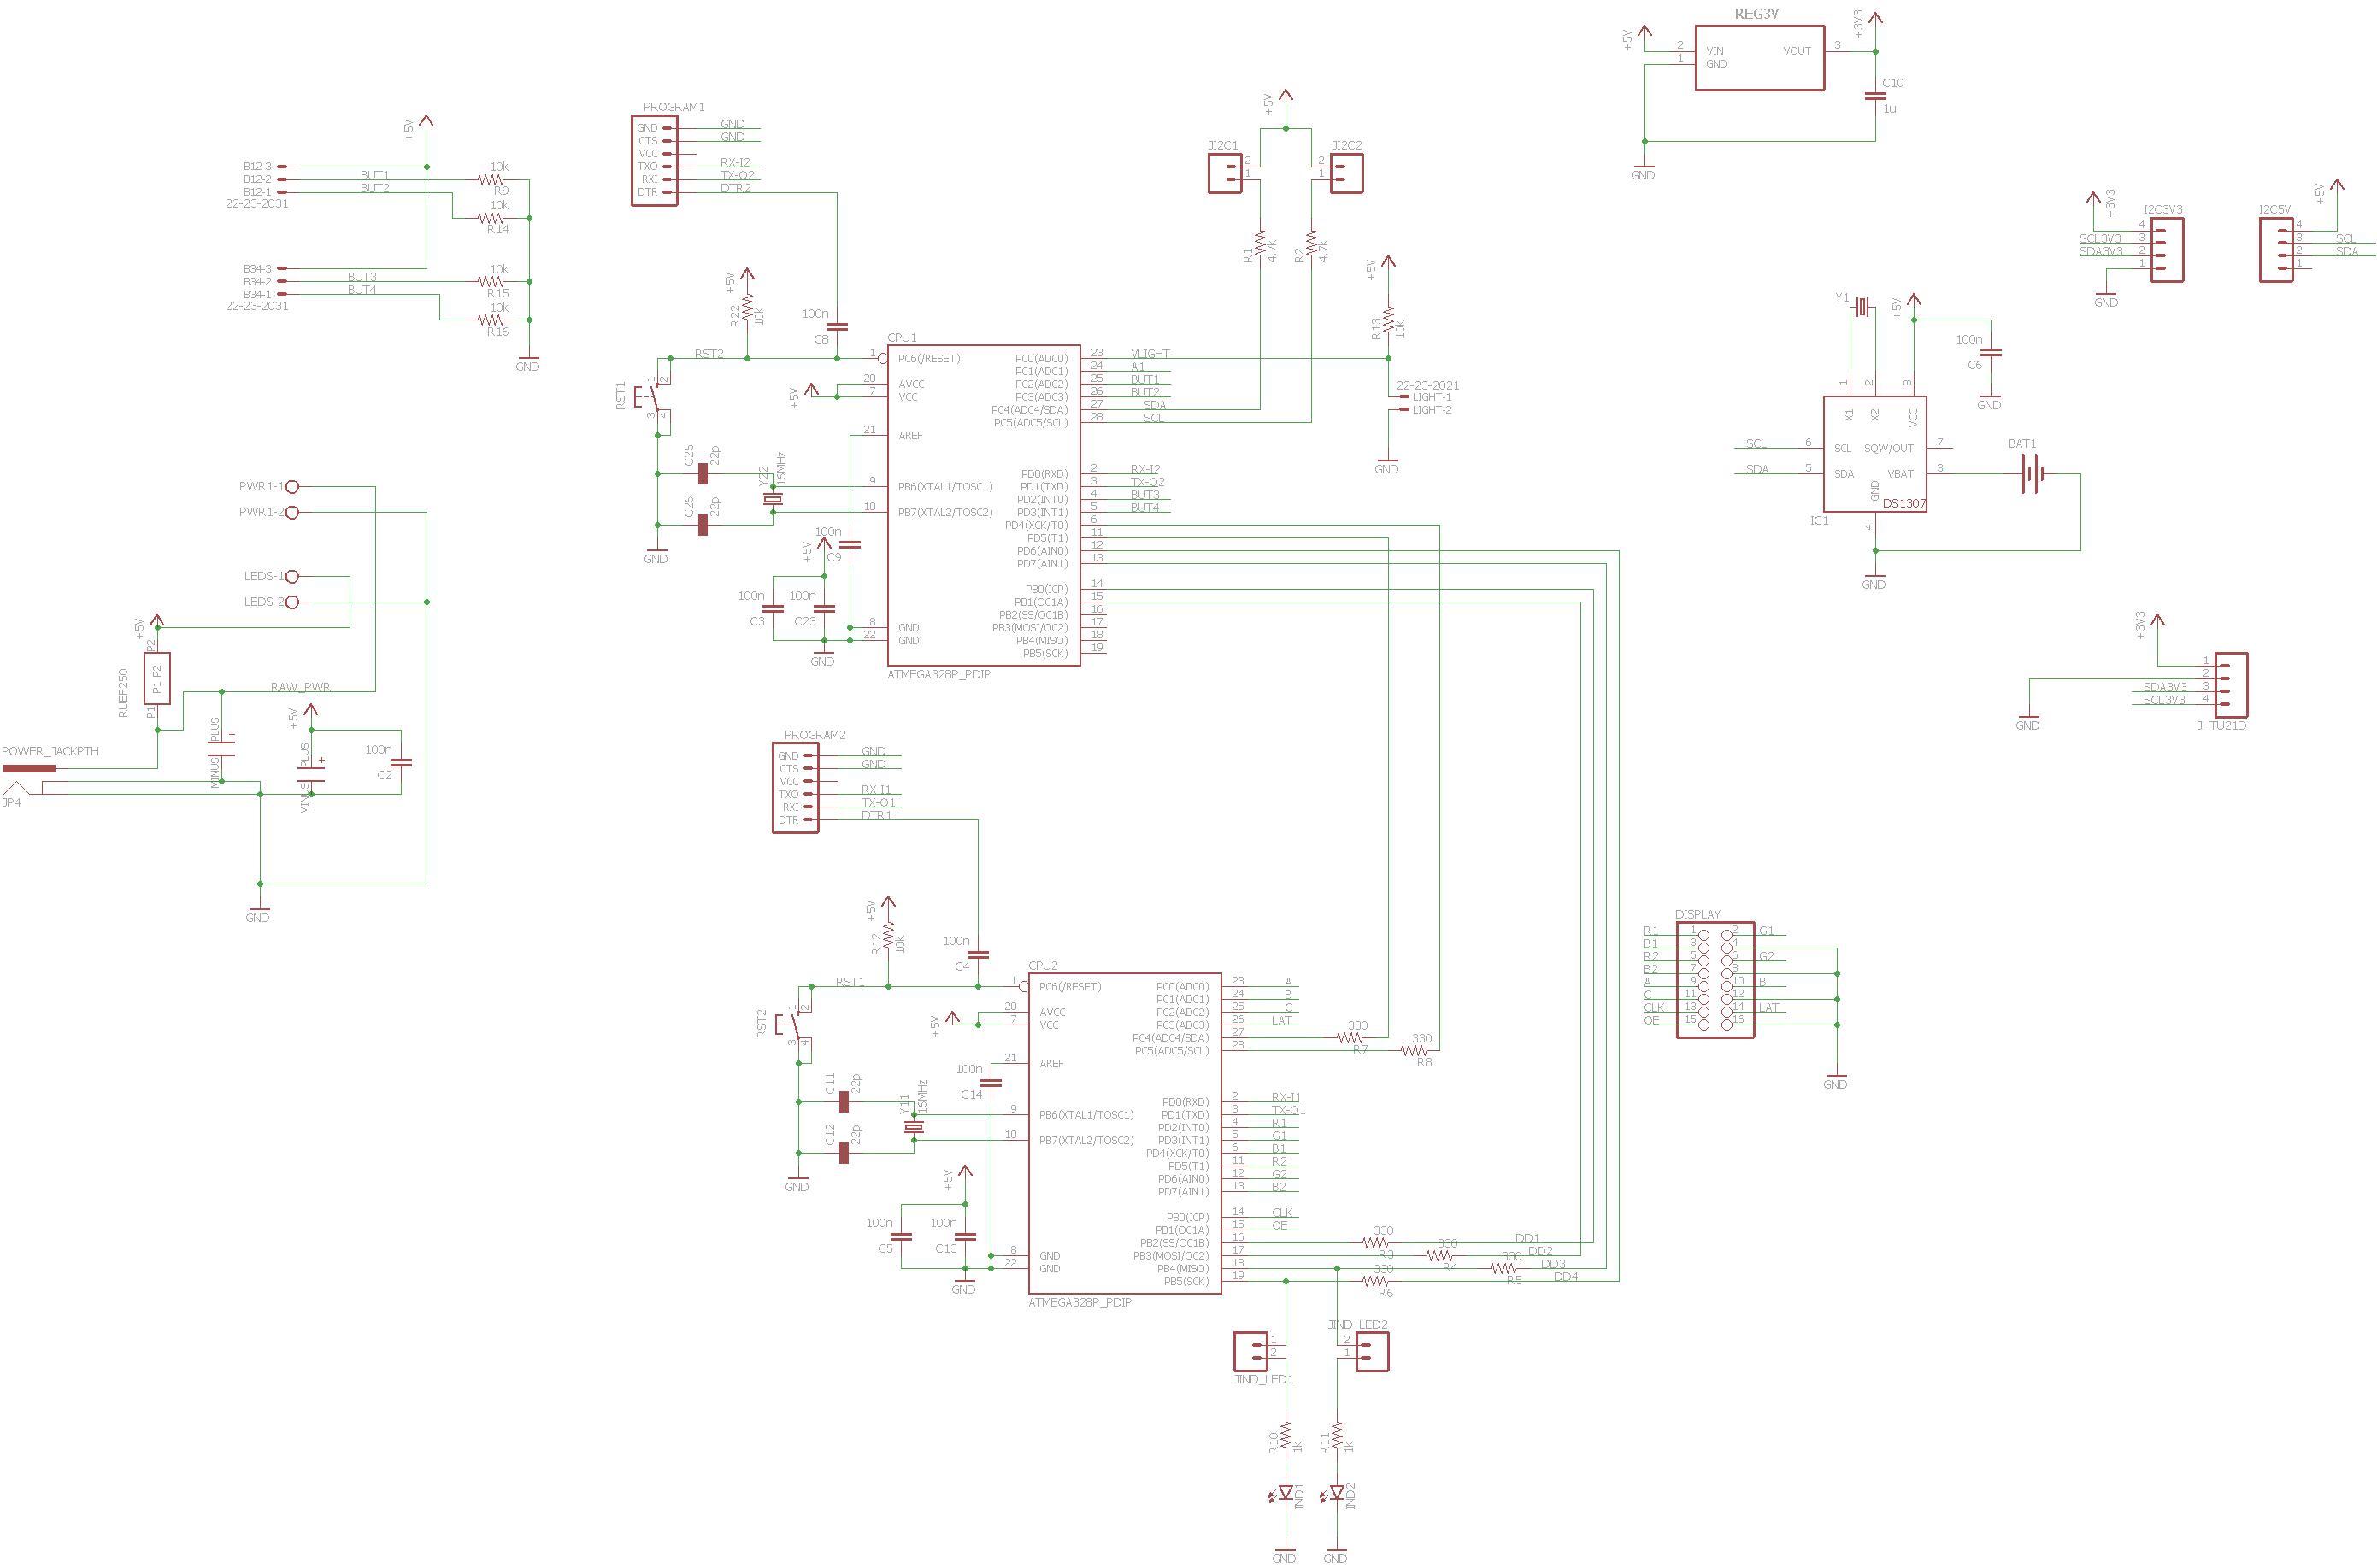 Arduino Based Clock Using 16x32 RGB LED Matrix - Hackster io